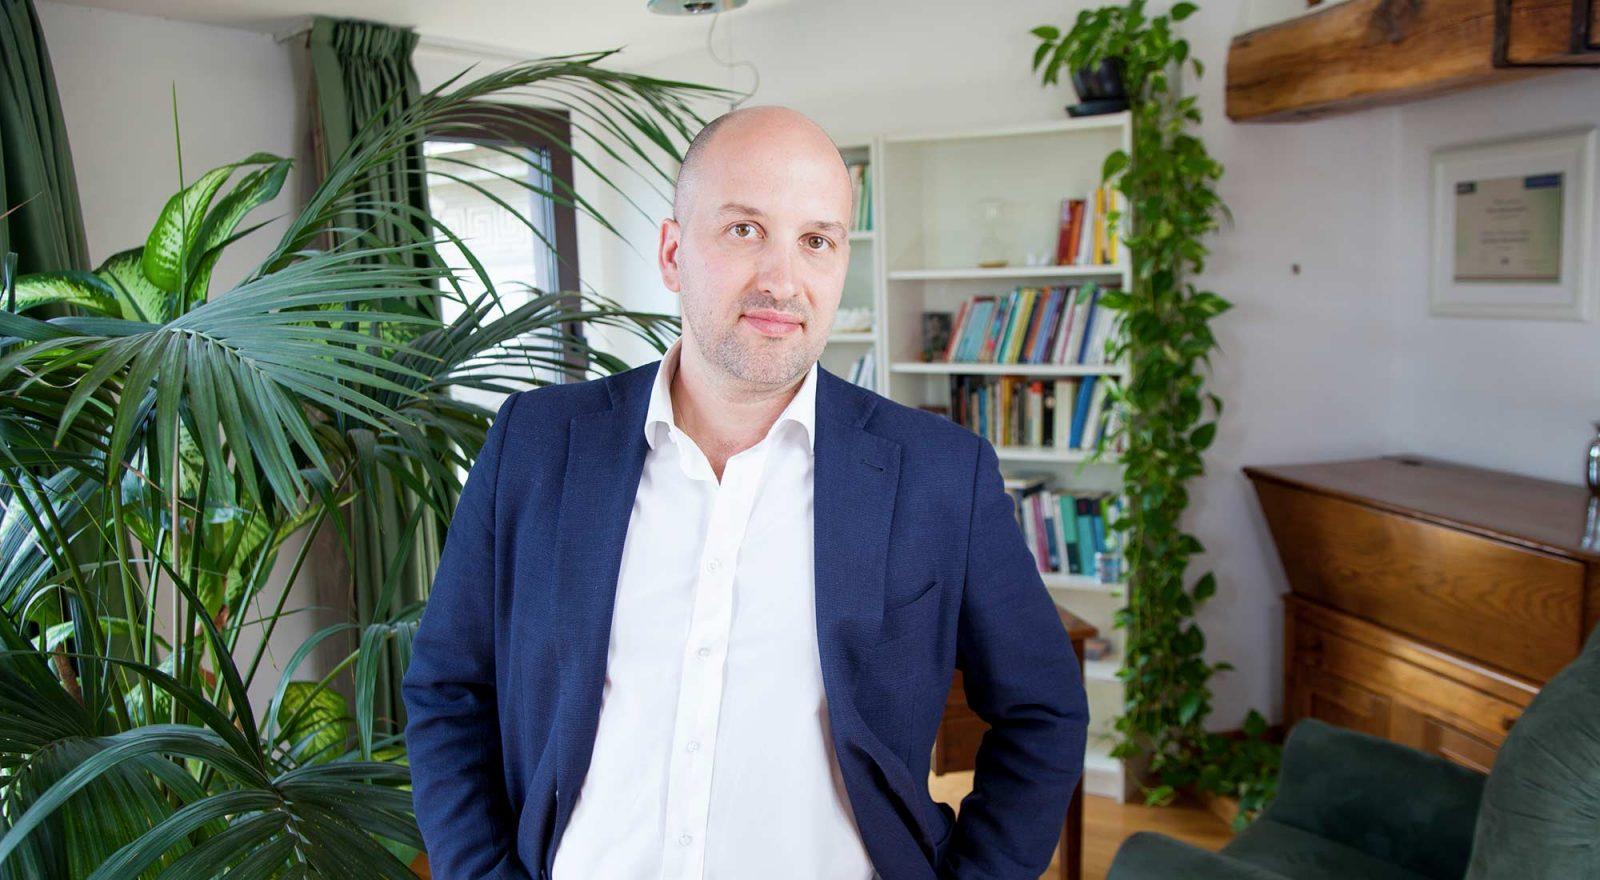 Psicologo Milano - dr. Enrico Gamba.